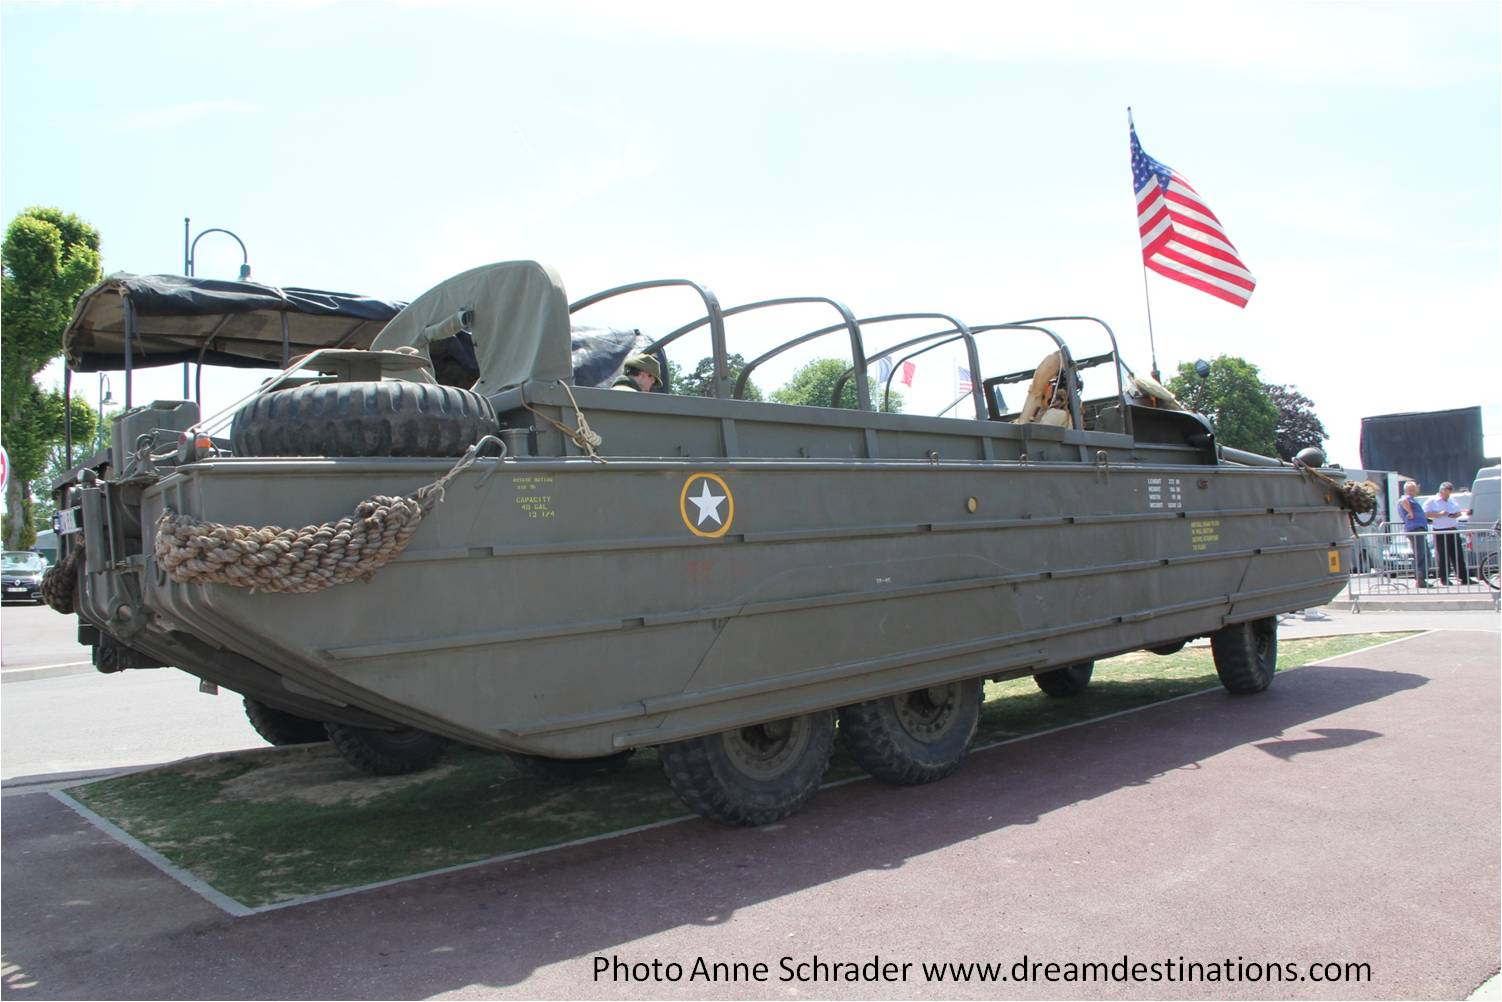 DUKW landing craft on display in Ste Mere Eglise 2014